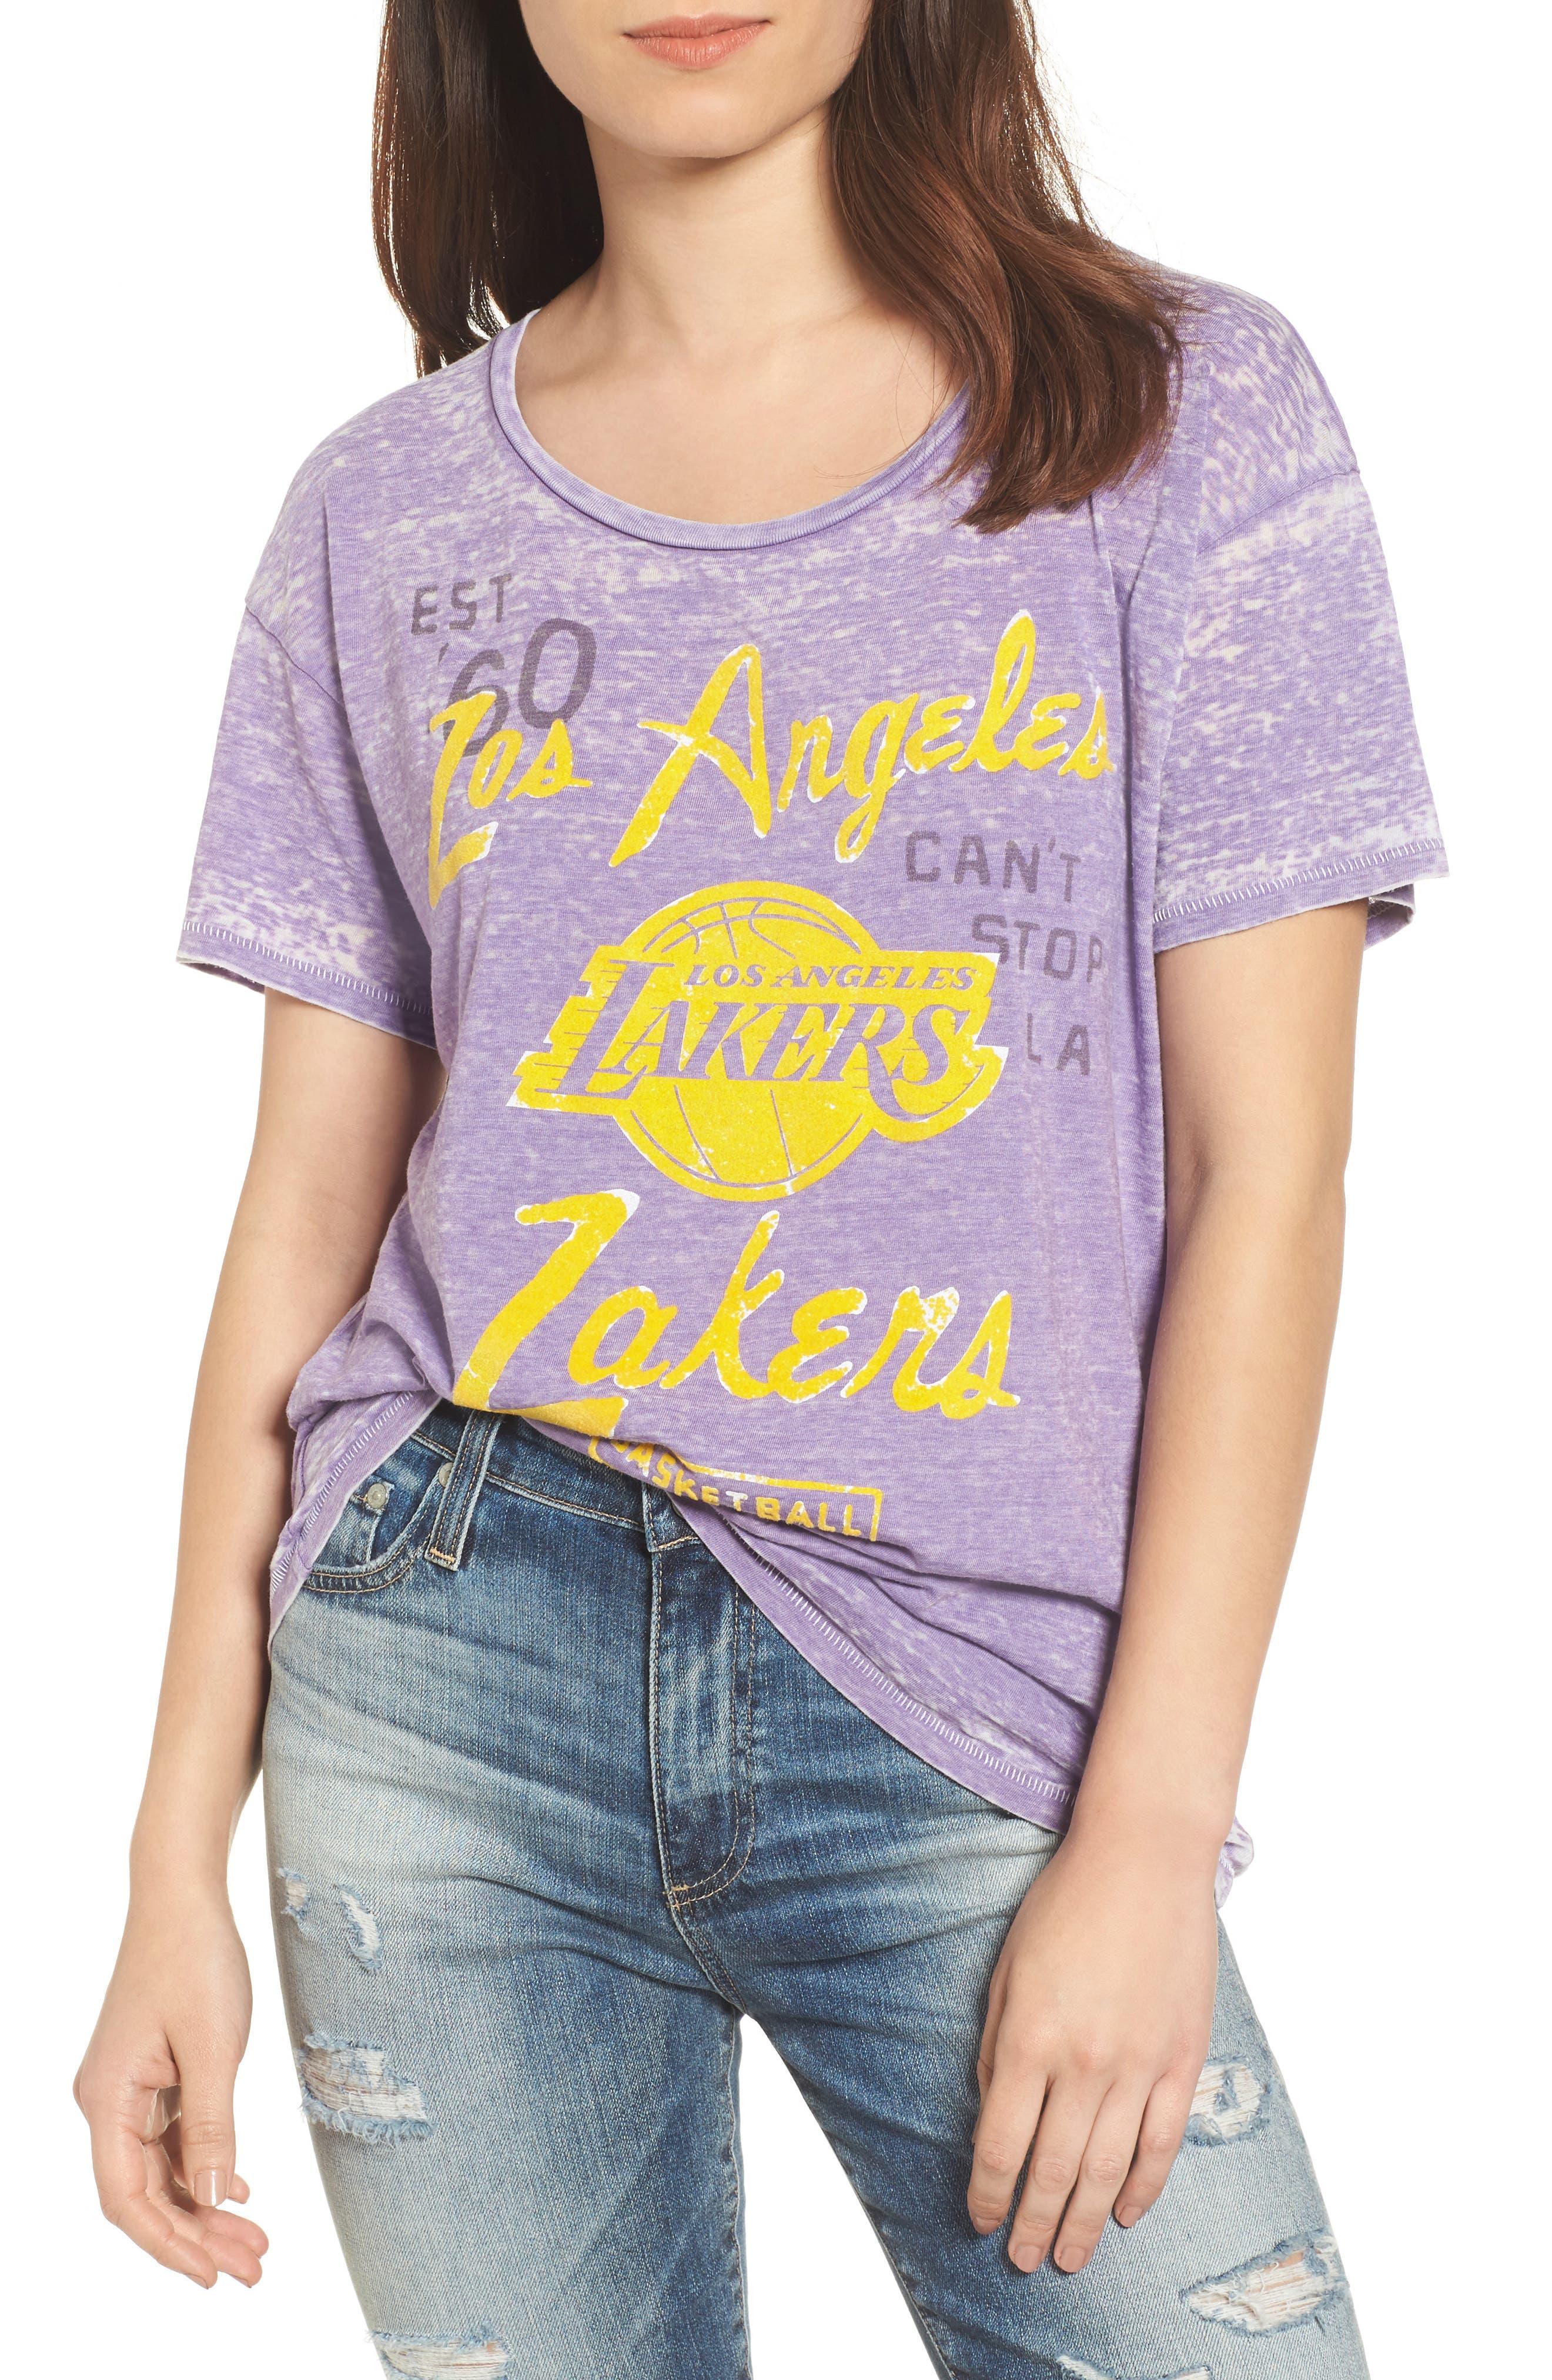 NBA Los Angeles Lakers Tee,                             Main thumbnail 1, color,                             543